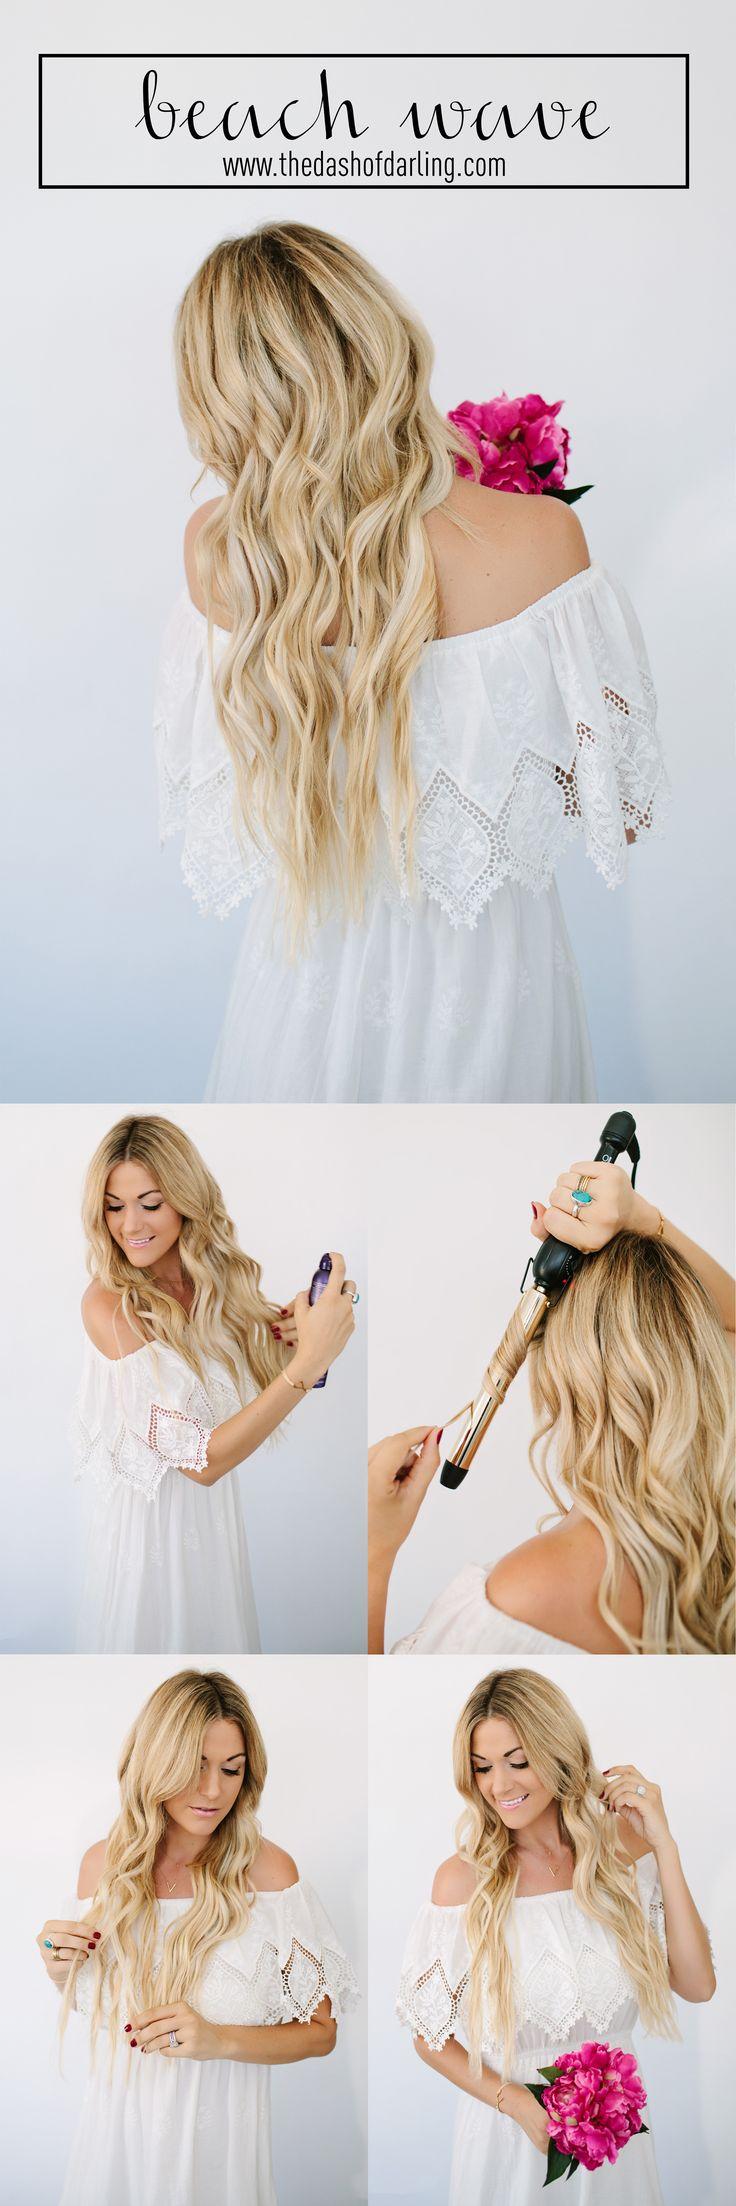 Mermaid beach waves hair tutorial by @caitlinclairexo